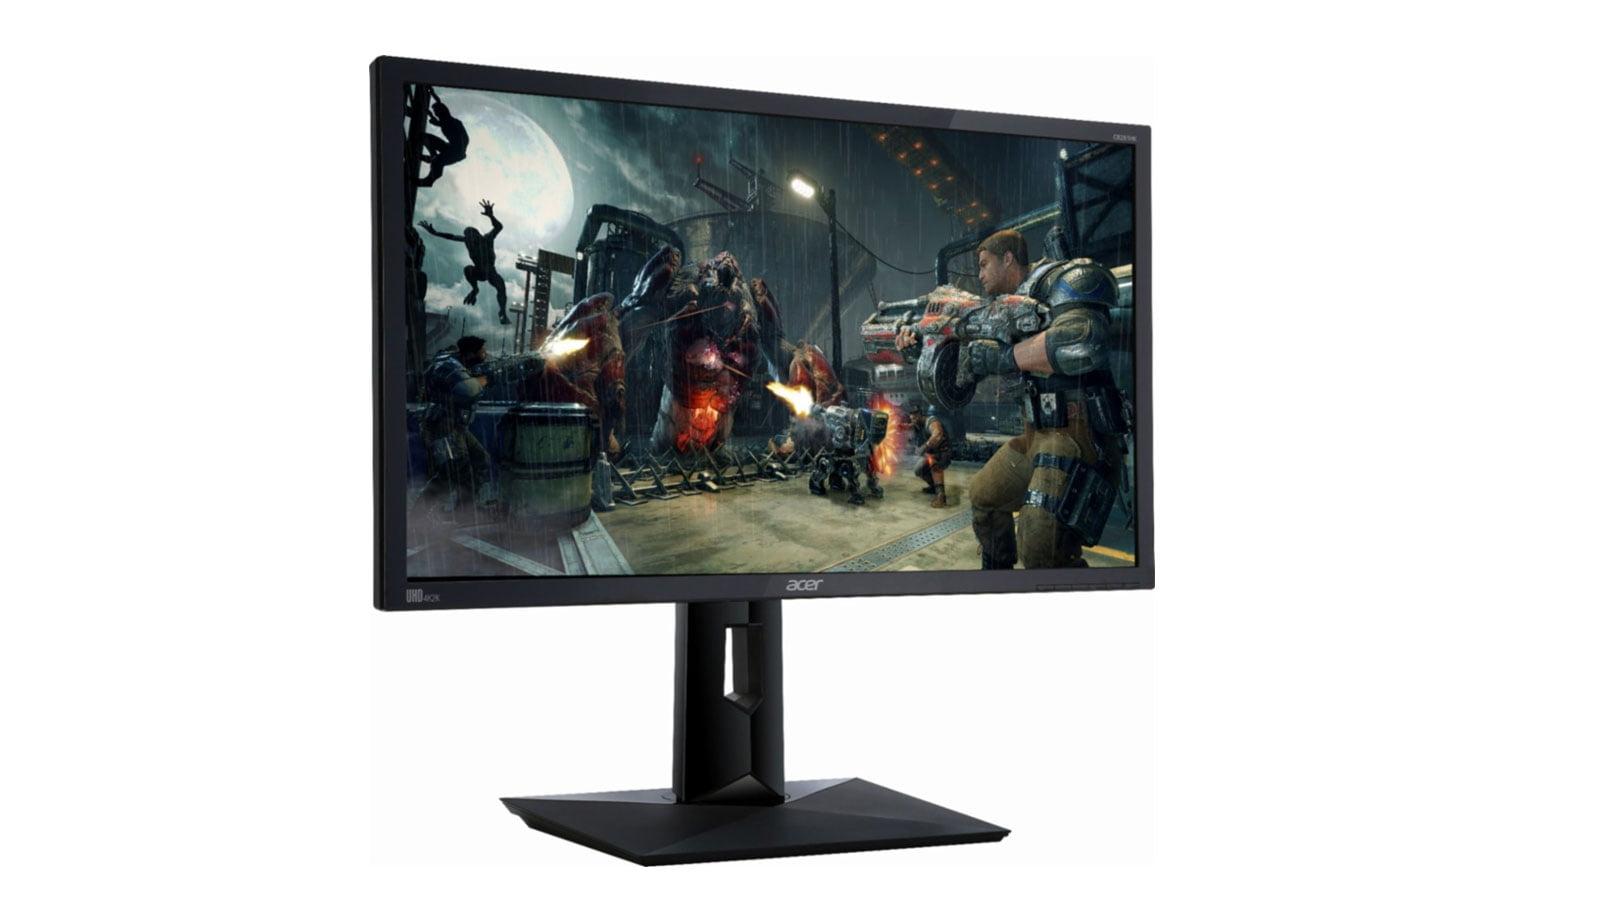 Acer – CB281HK 28″ LED 4K UHD FreeSync Monitor – Open Box